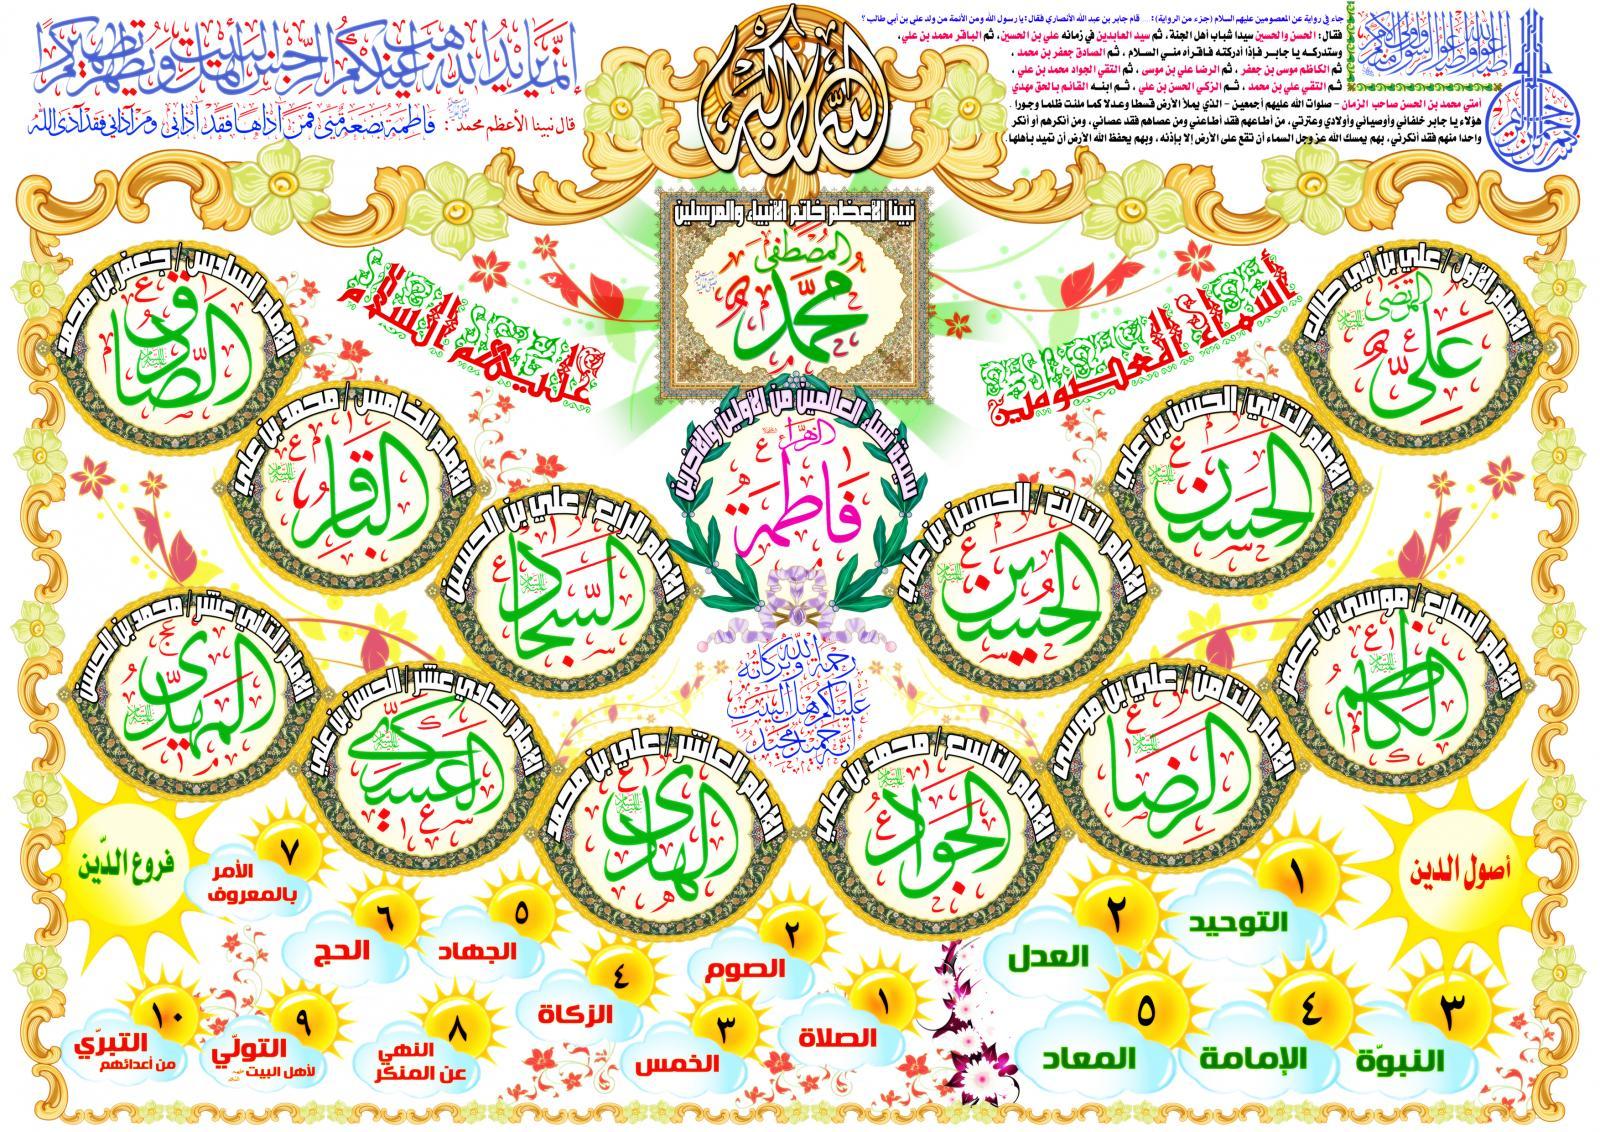 Maula Ali Shrine Wallpaper: 14 Ma'sumin, Ayat Al-Tathir, Ahadith, Usul Al-Din, Furu